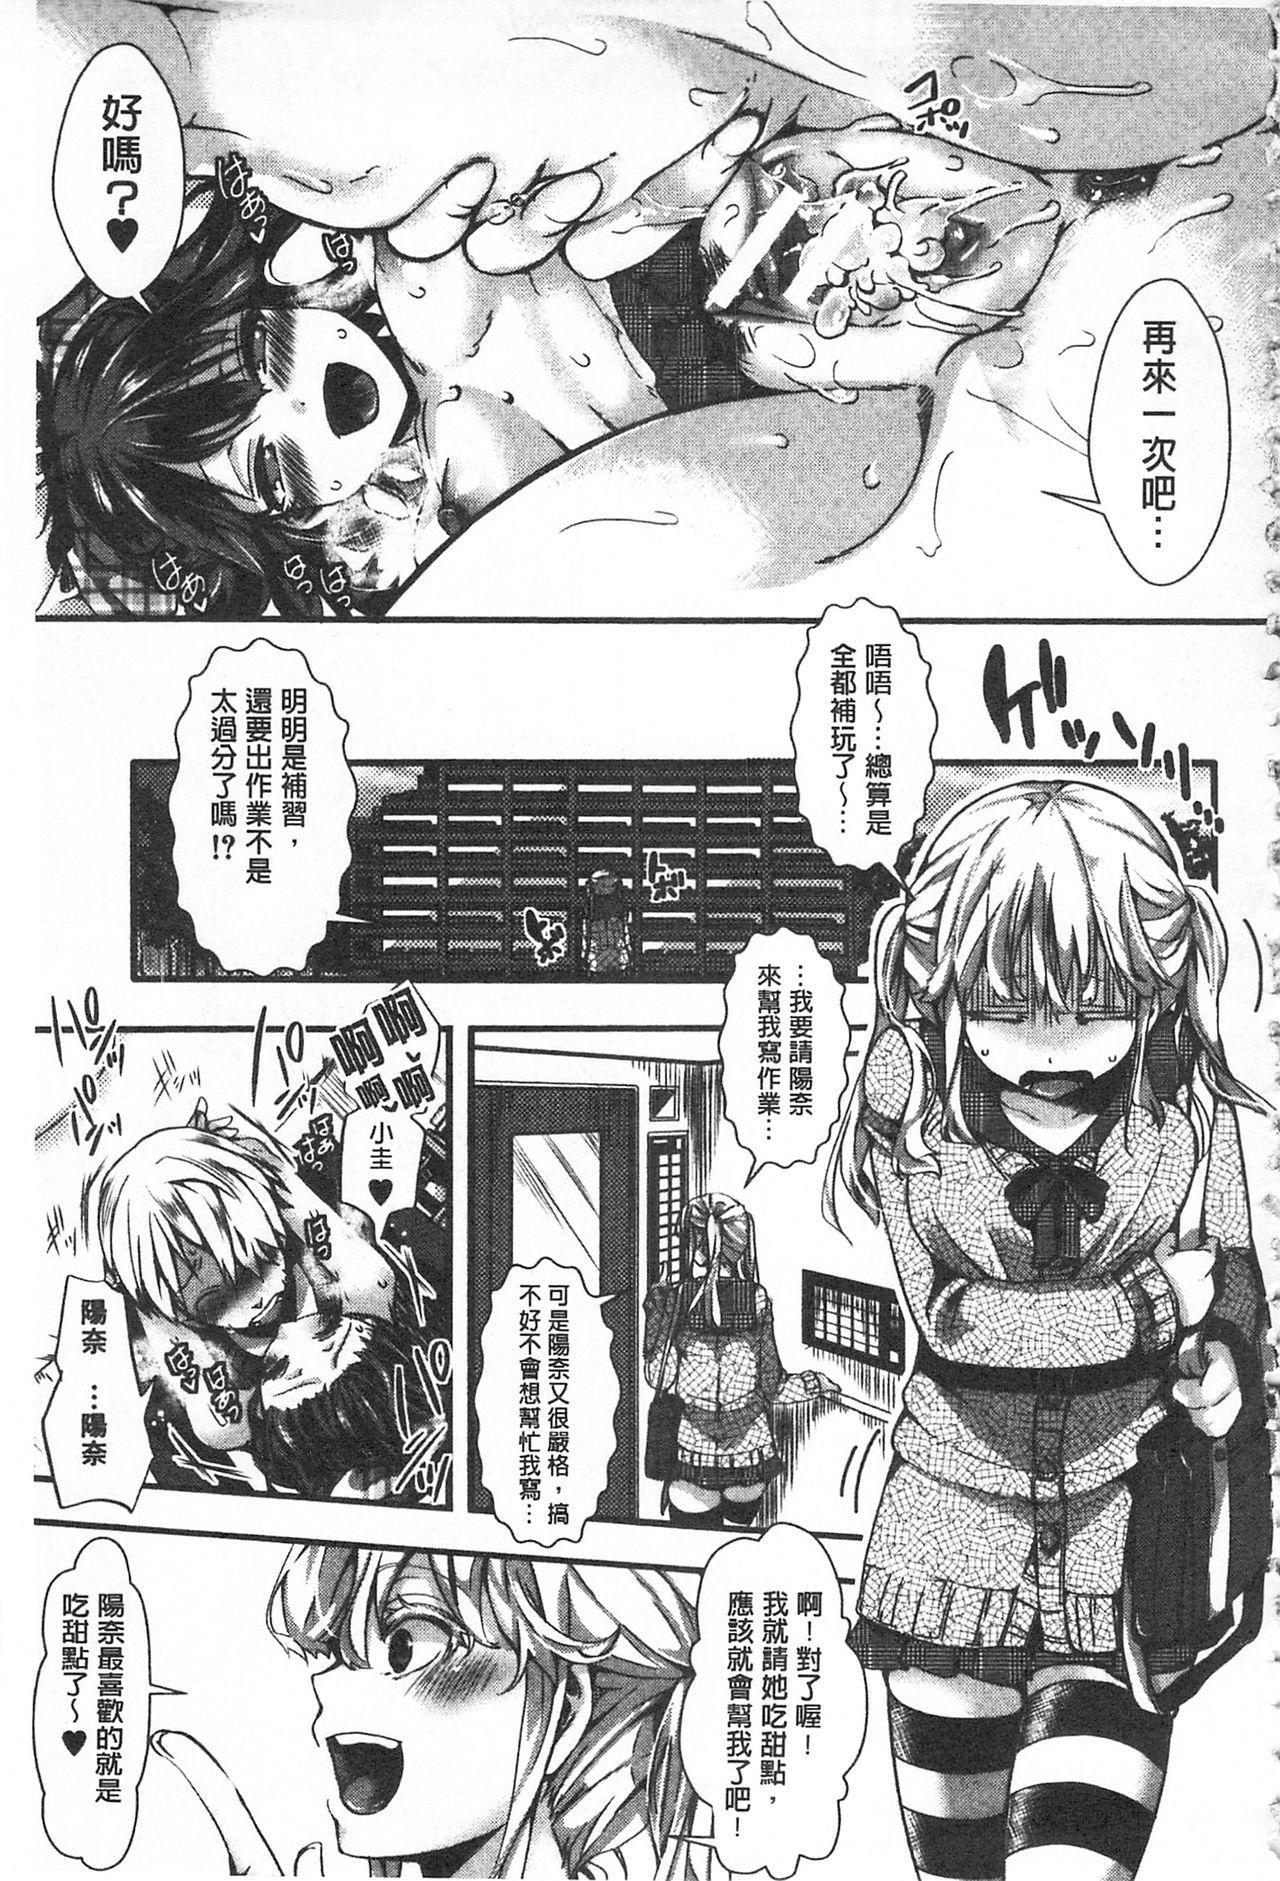 [hal] Daienjou -Ikare Ikasare Iki Ikare-   ∞艶嬢 -洩出來被搞到洩掛了被搞掛-  [Chinese] 136